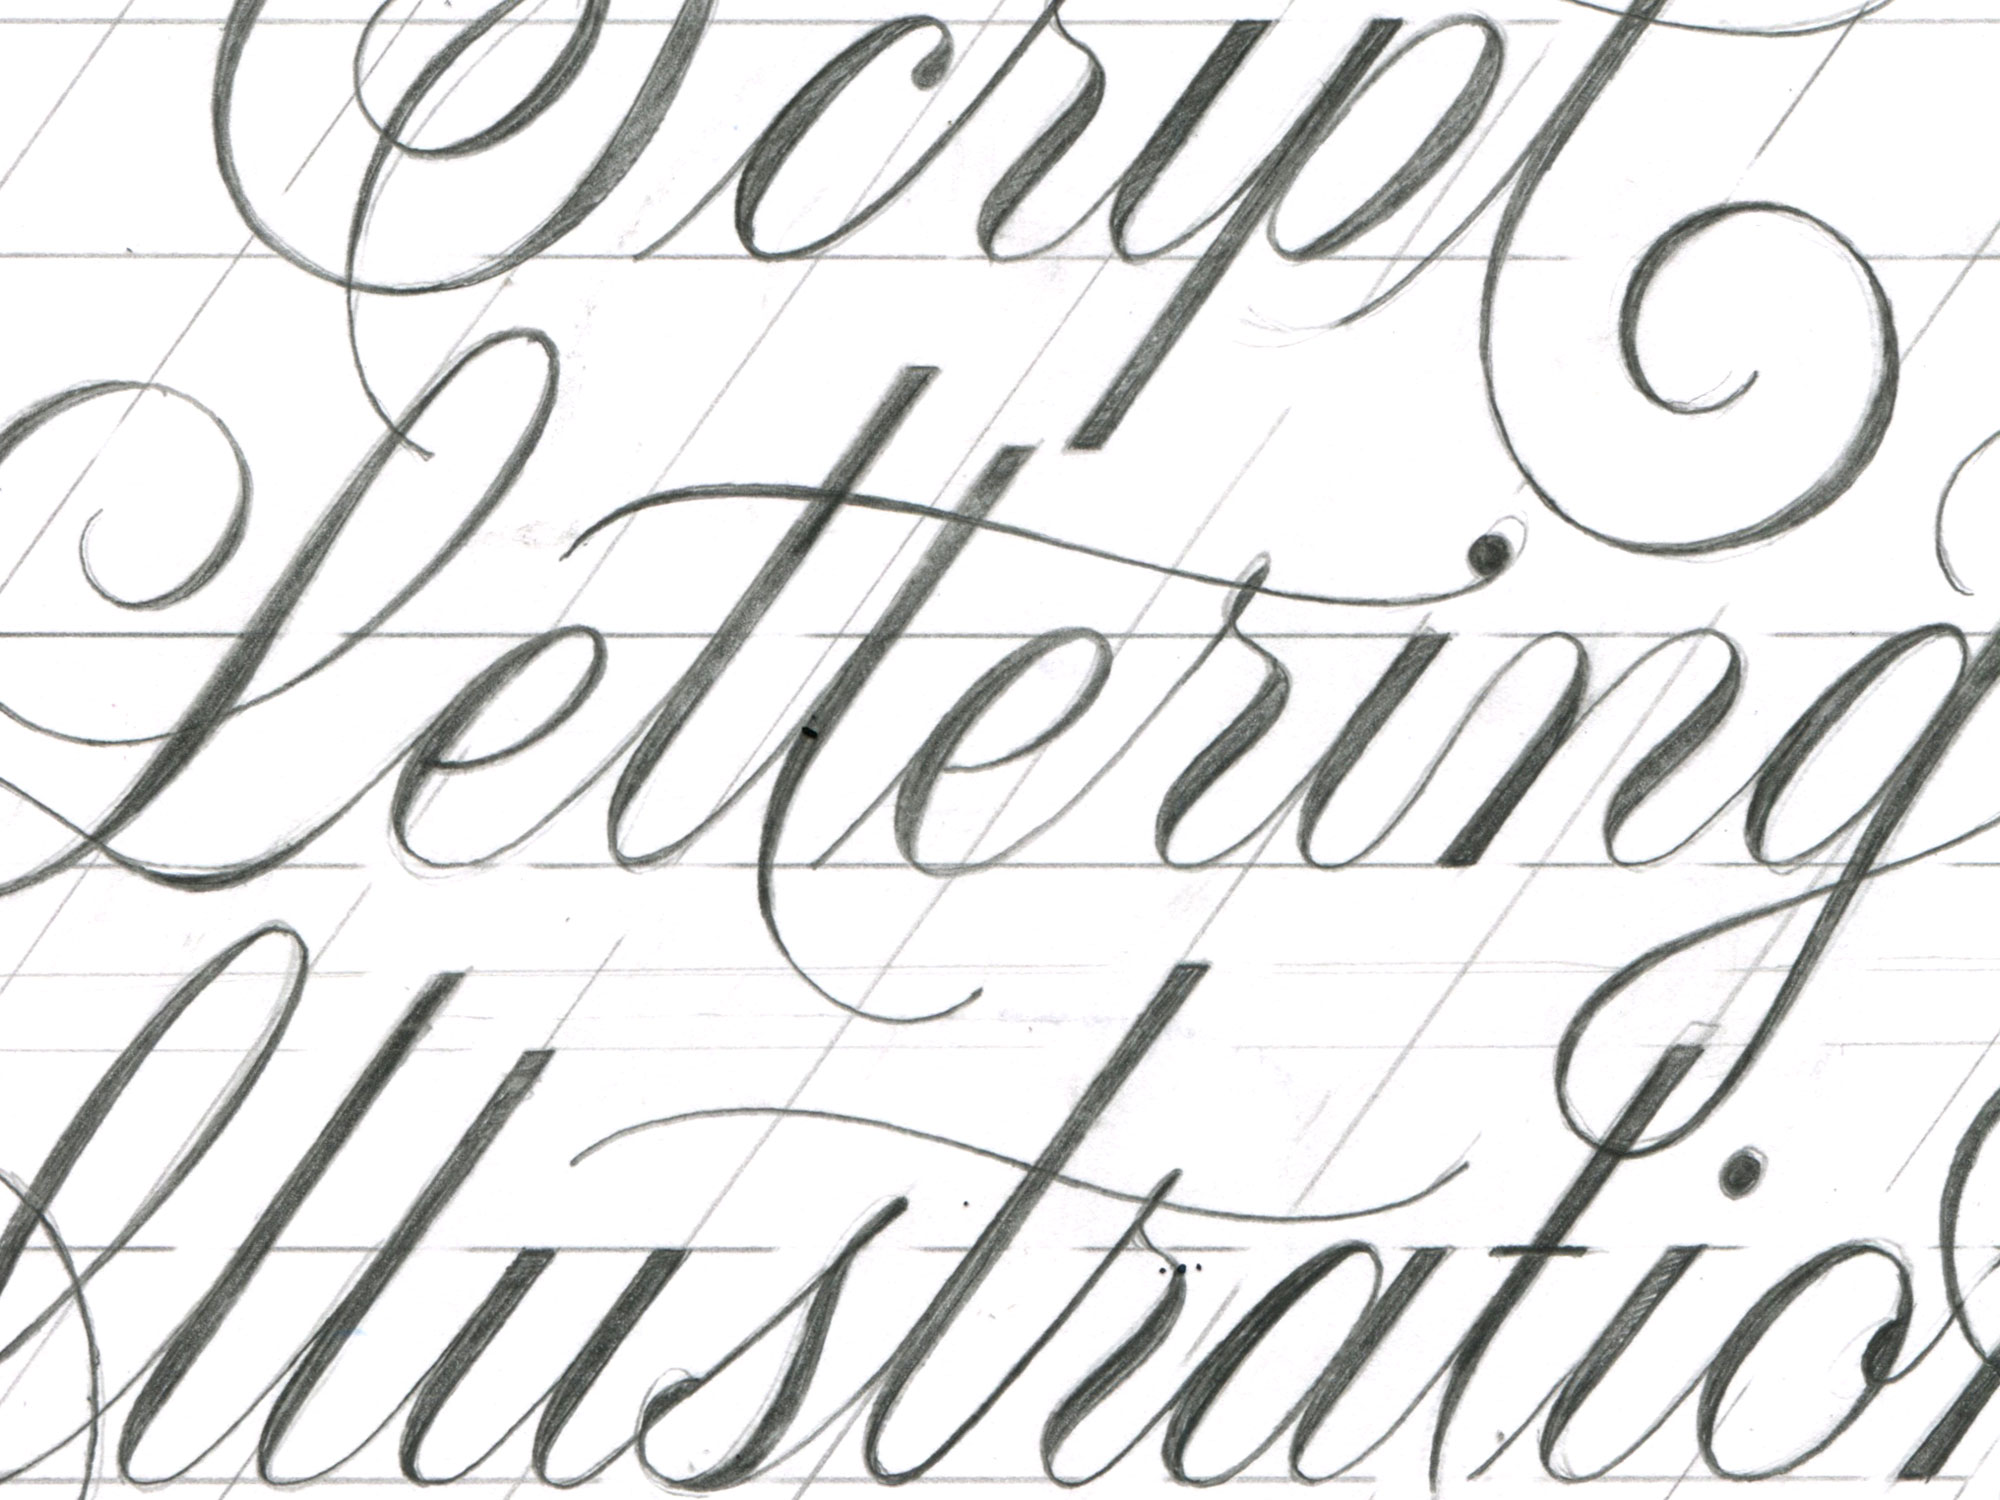 2000x1500 Script Lettering Illustration Process Pies Brand